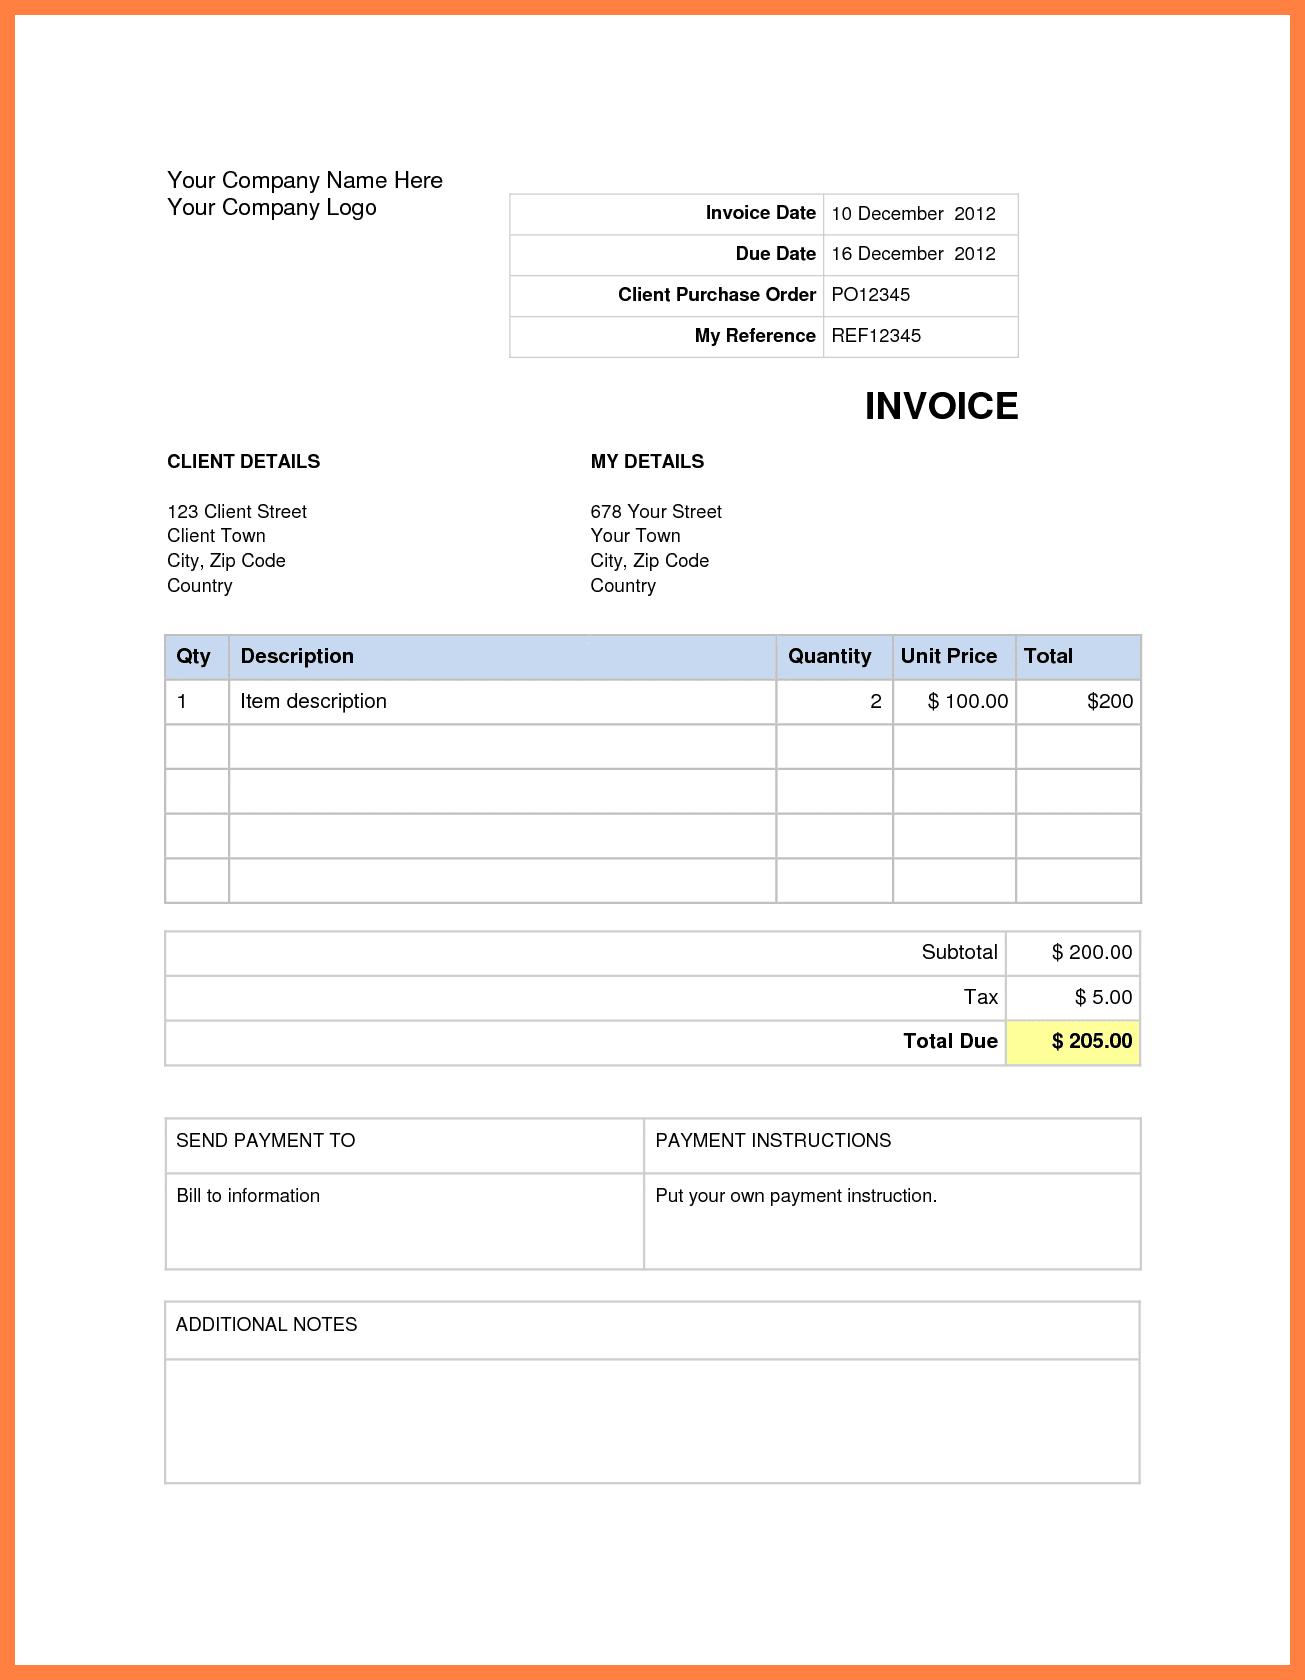 Microsoft Word 2010 Invoice Template Invoice Templates For Microsoft Word Spreadsheet Templates for Busines Spreadsheet Templates for Busines Free Invoice Templates For Microsoft Word